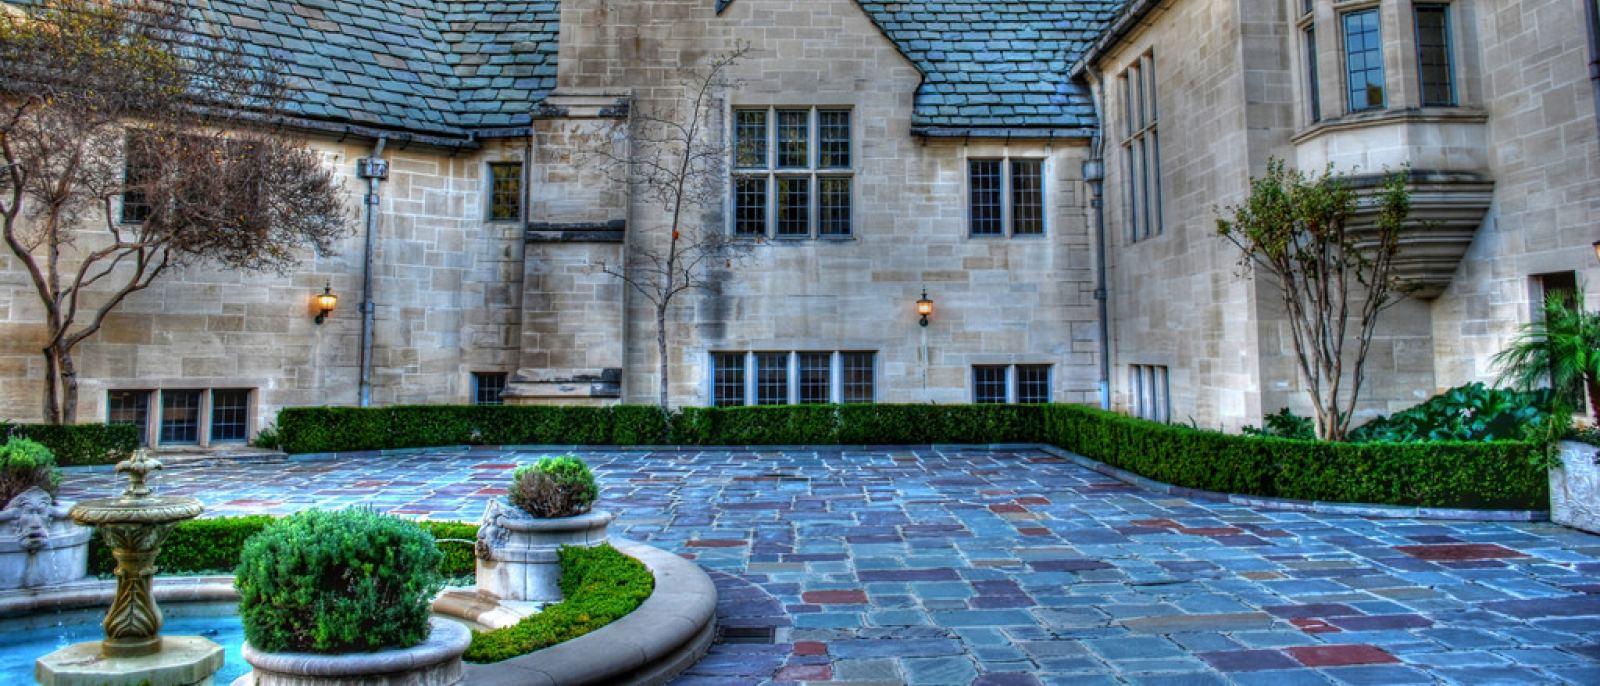 Greystone Mansion Inner Courtyard